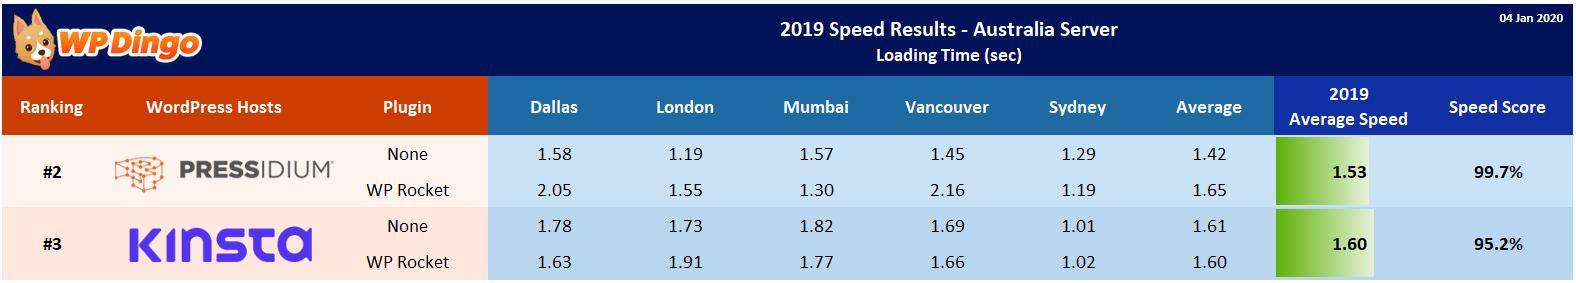 2019 Kinsta vs Pressidium Speed Table - Australia Server